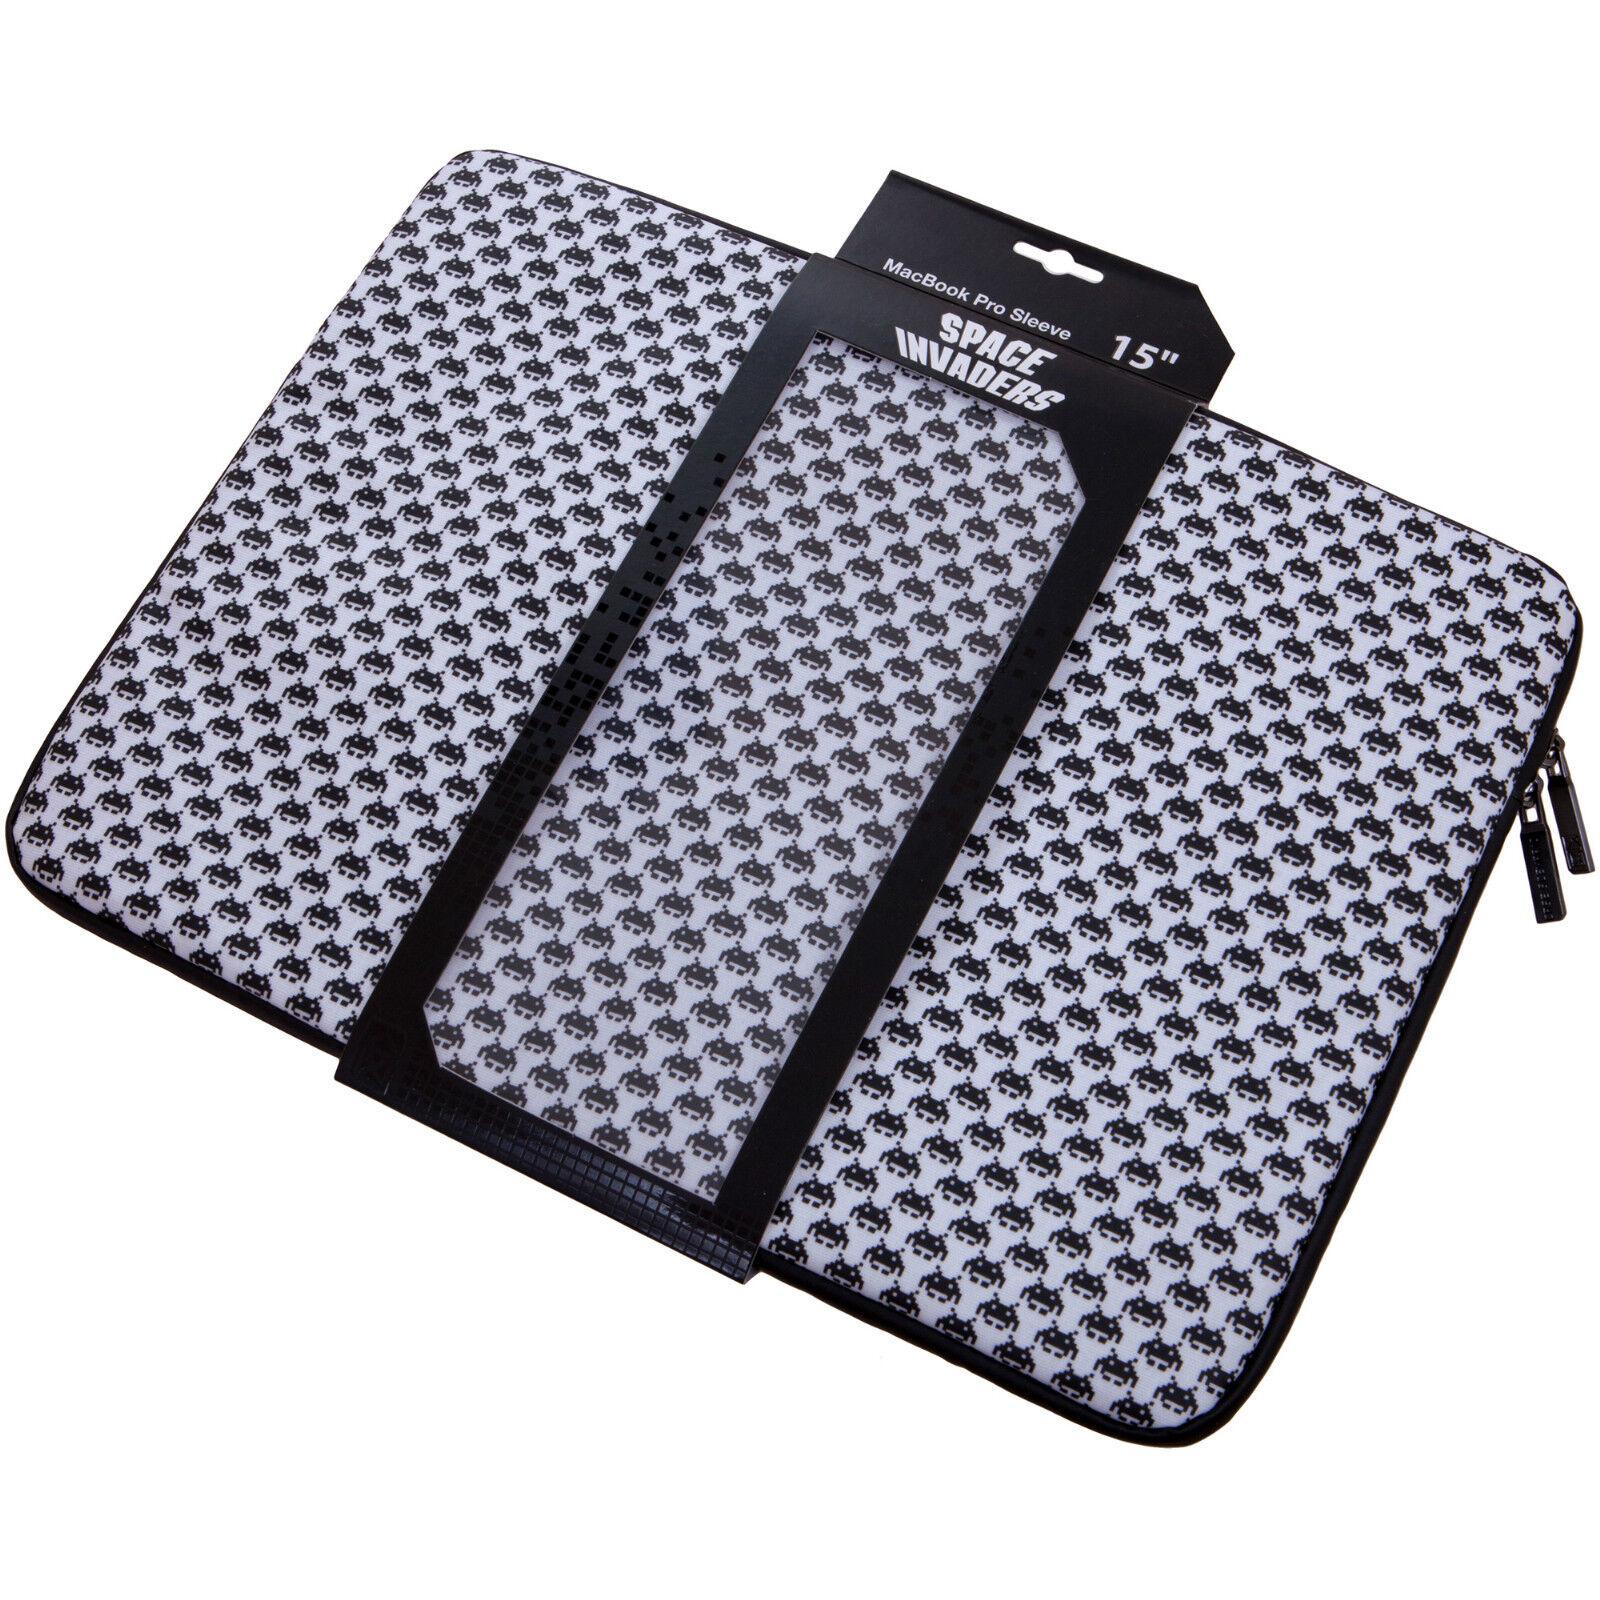 laptop tasche 15 6 15 zoll notebook schutzh lle samsung hp. Black Bedroom Furniture Sets. Home Design Ideas